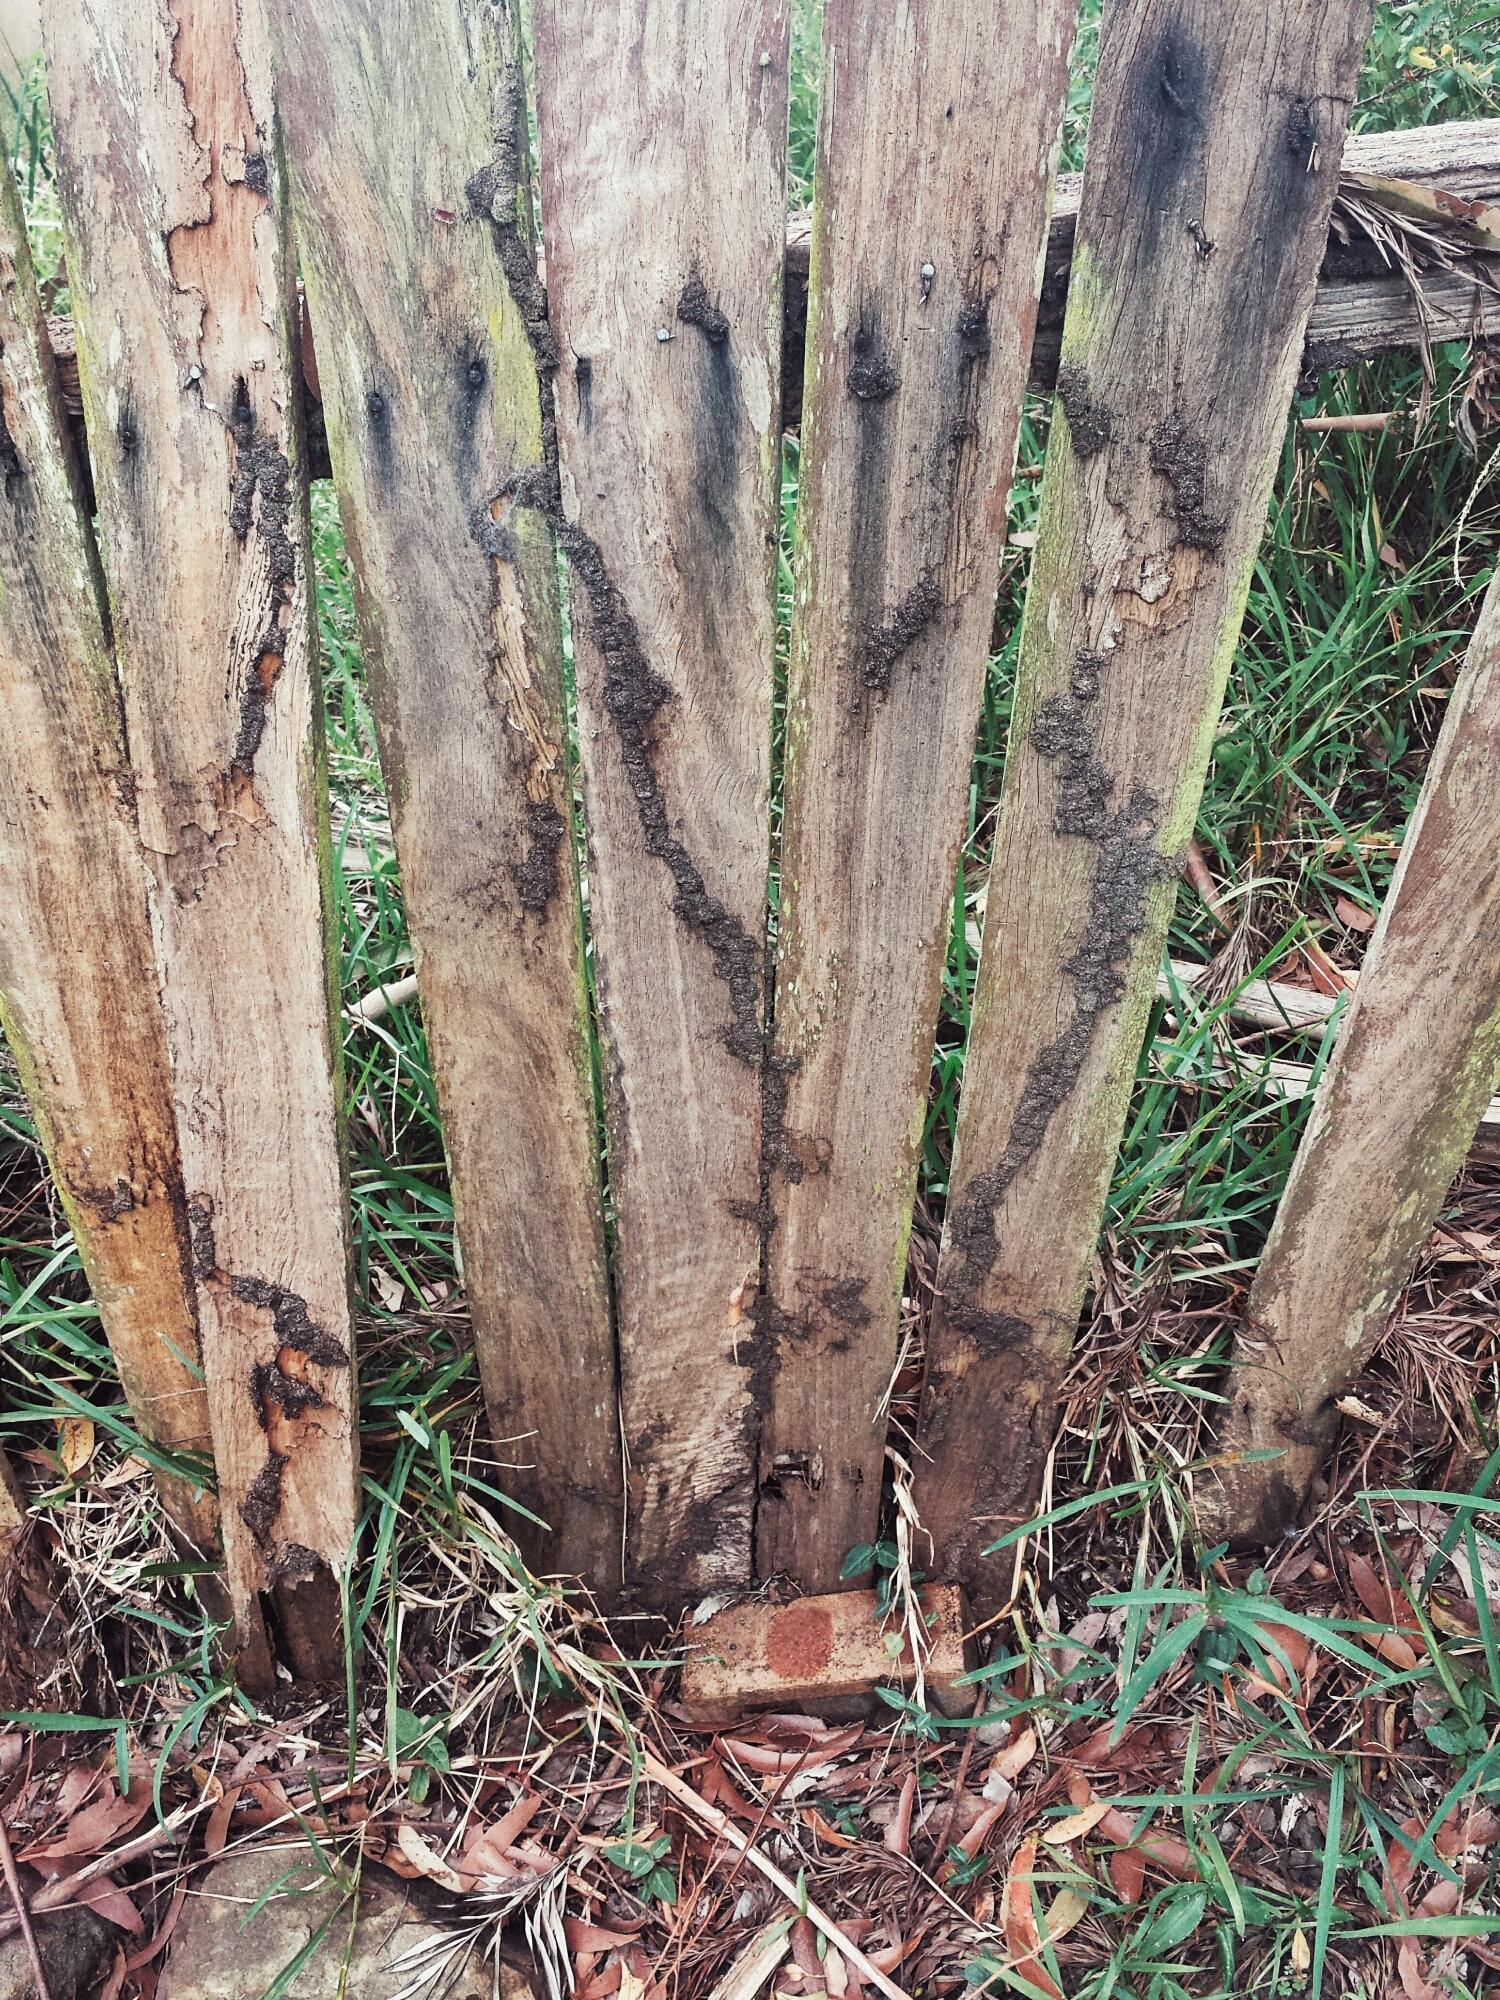 Nasutitermes mud shelter tubes on a fence.